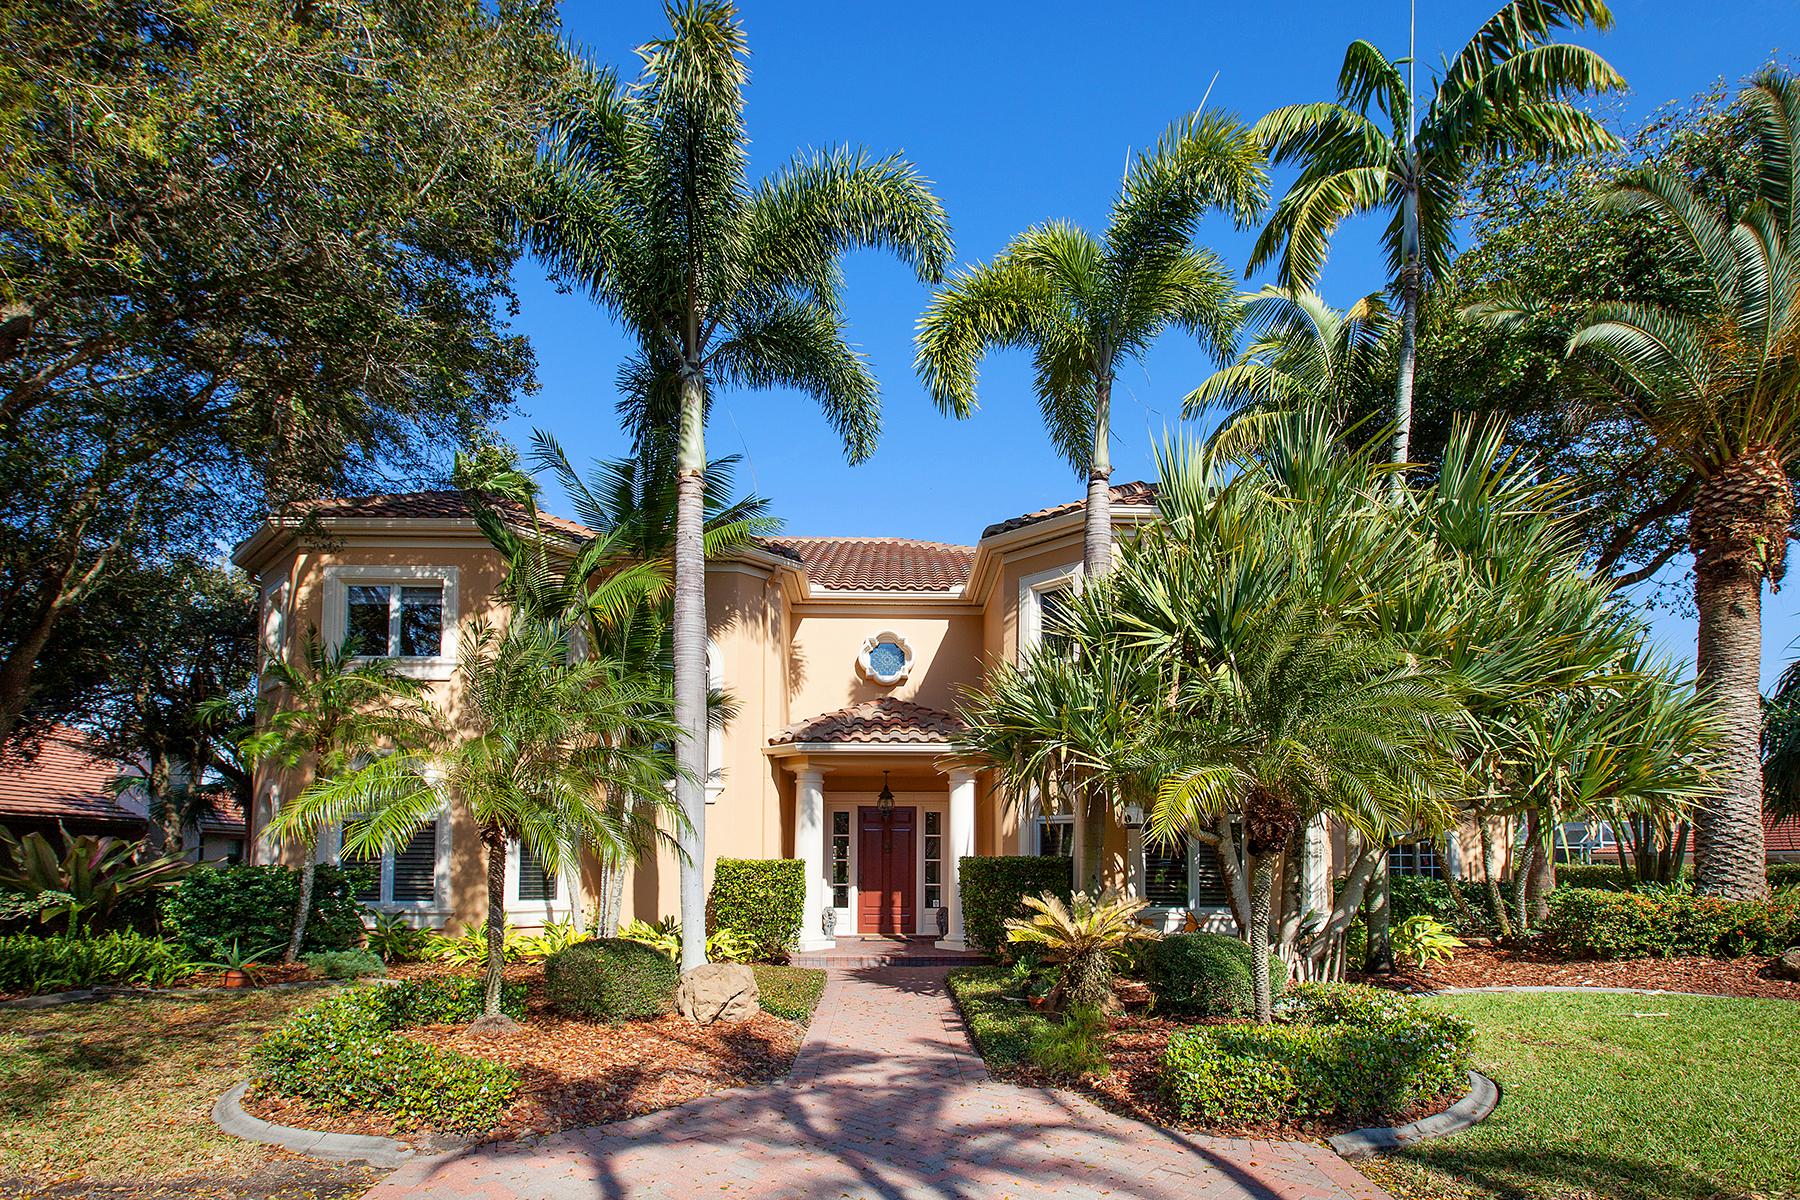 Single Family Home for Sale at PRESTANCIA 4079 Las Palmas Way Sarasota, Florida 34238 United States